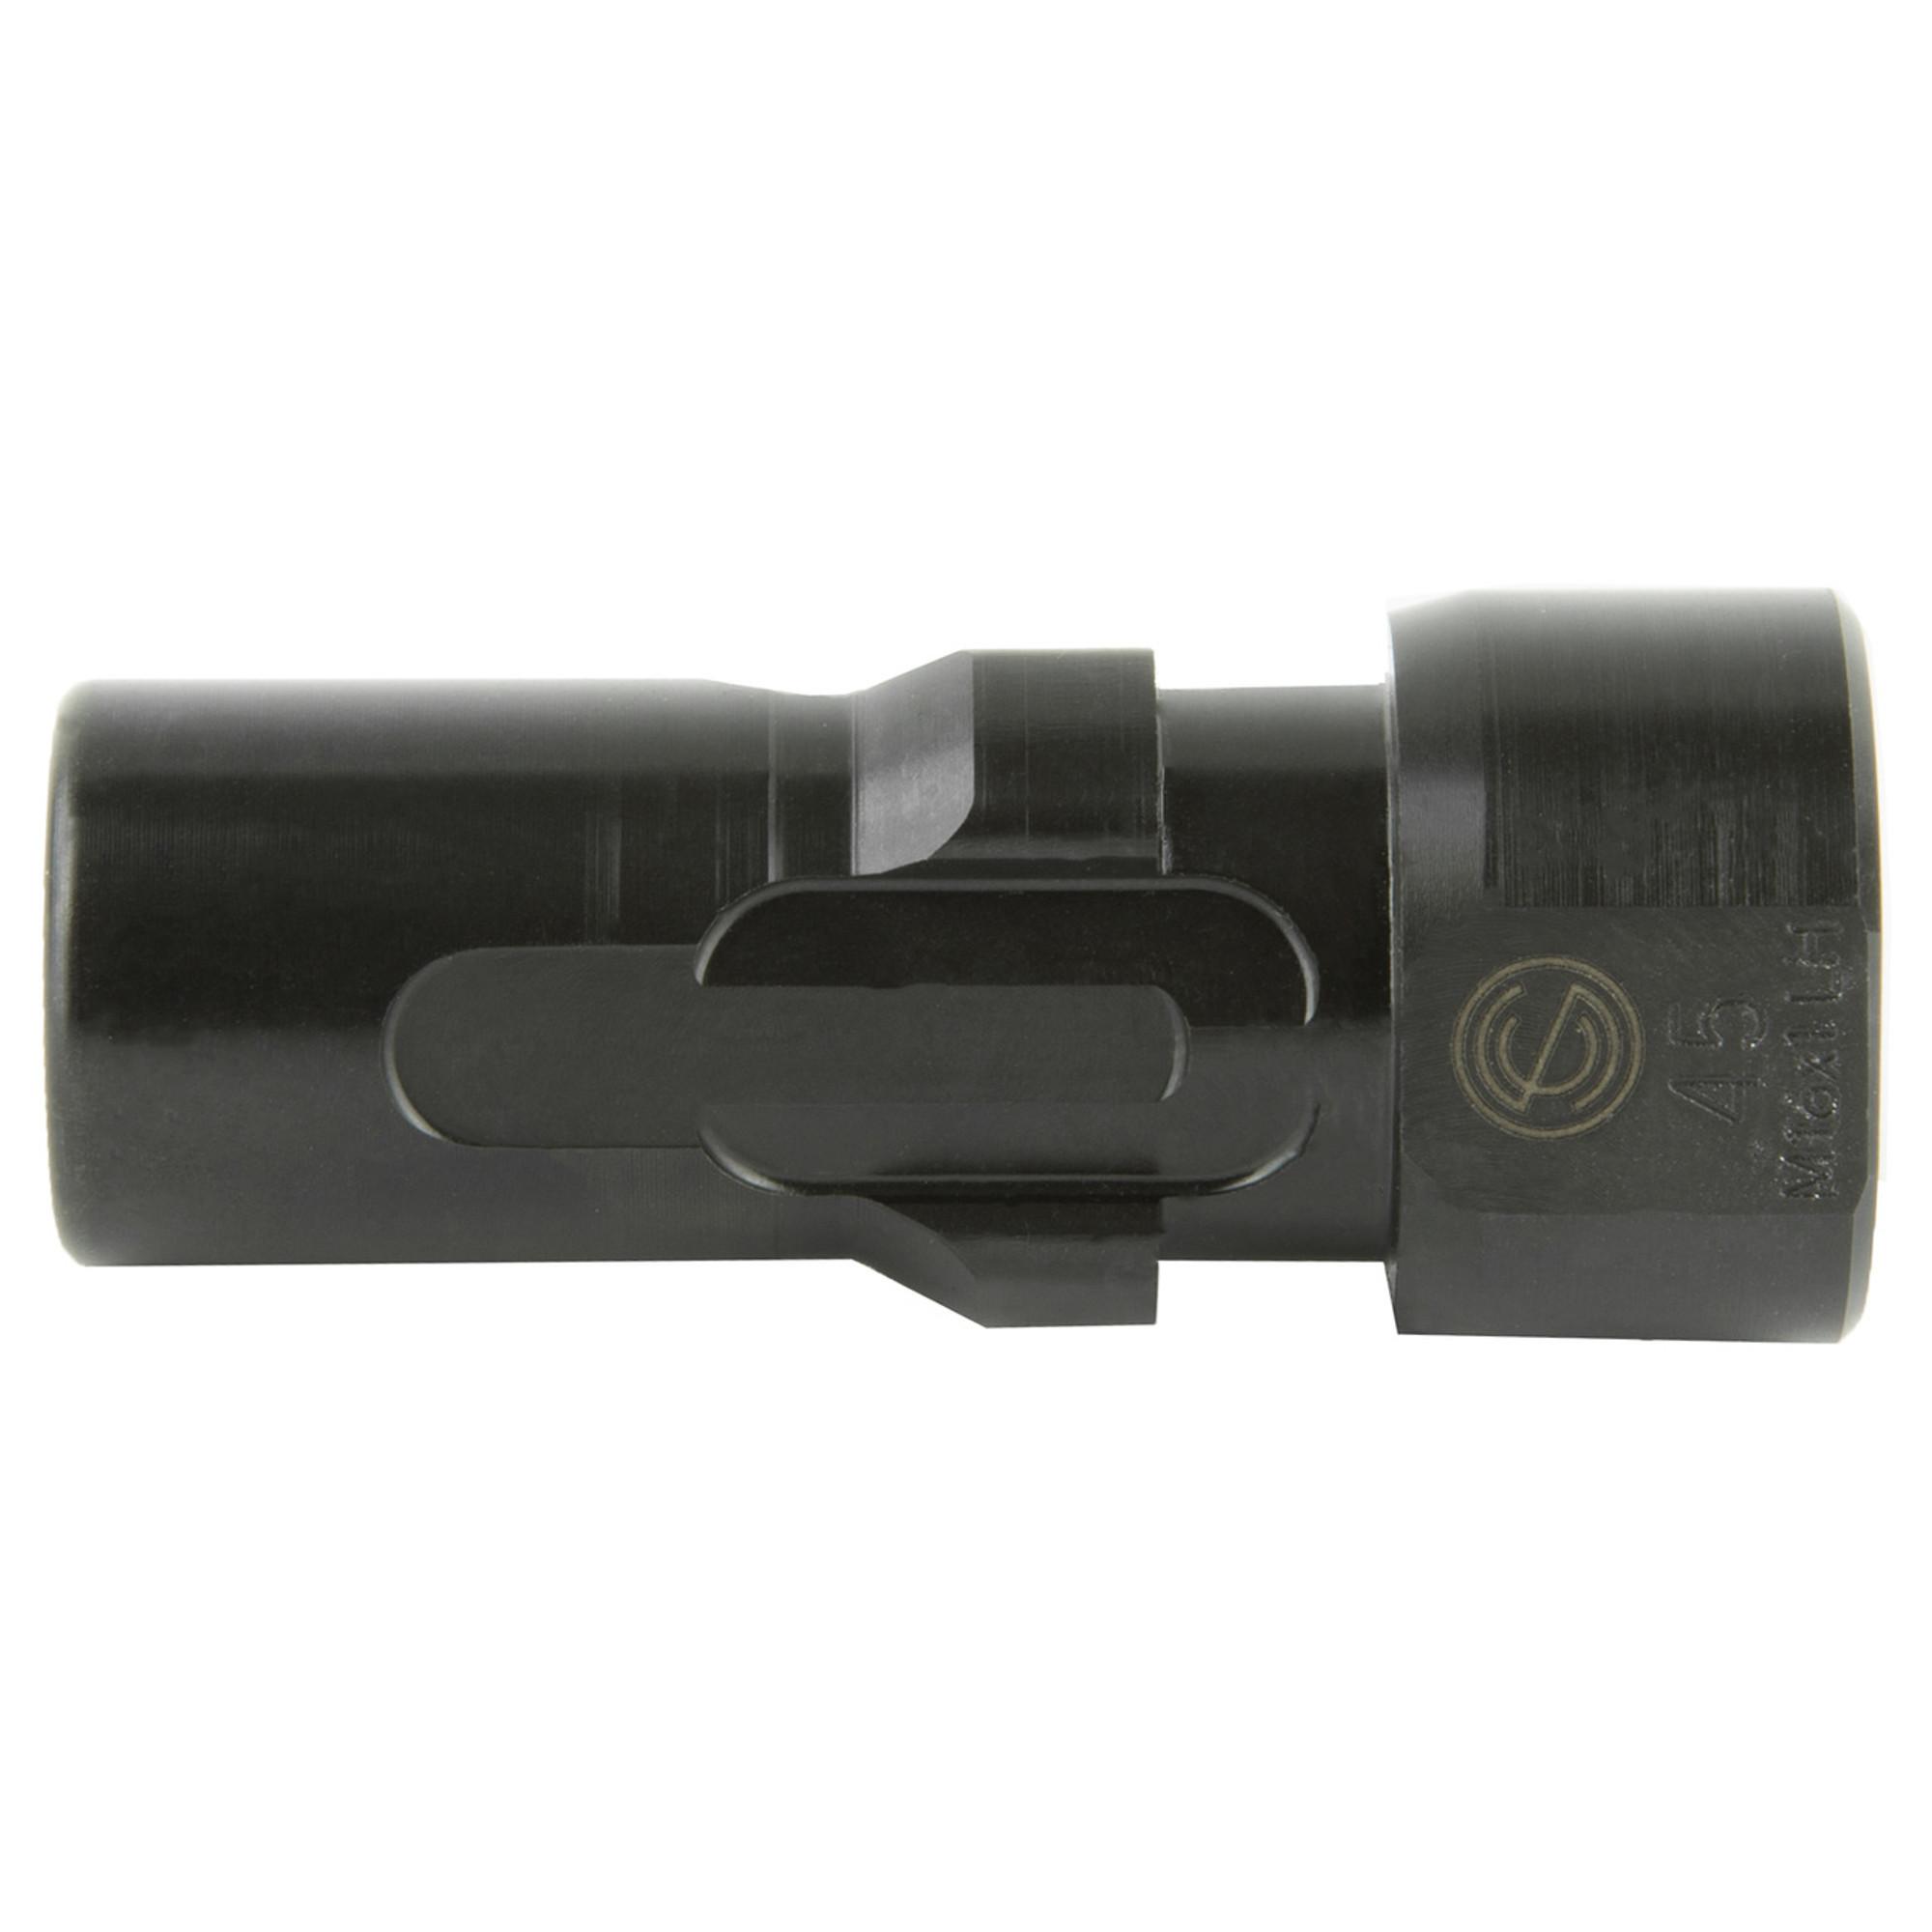 Sco 3lug Muzzle Device 45acp M16x1lh